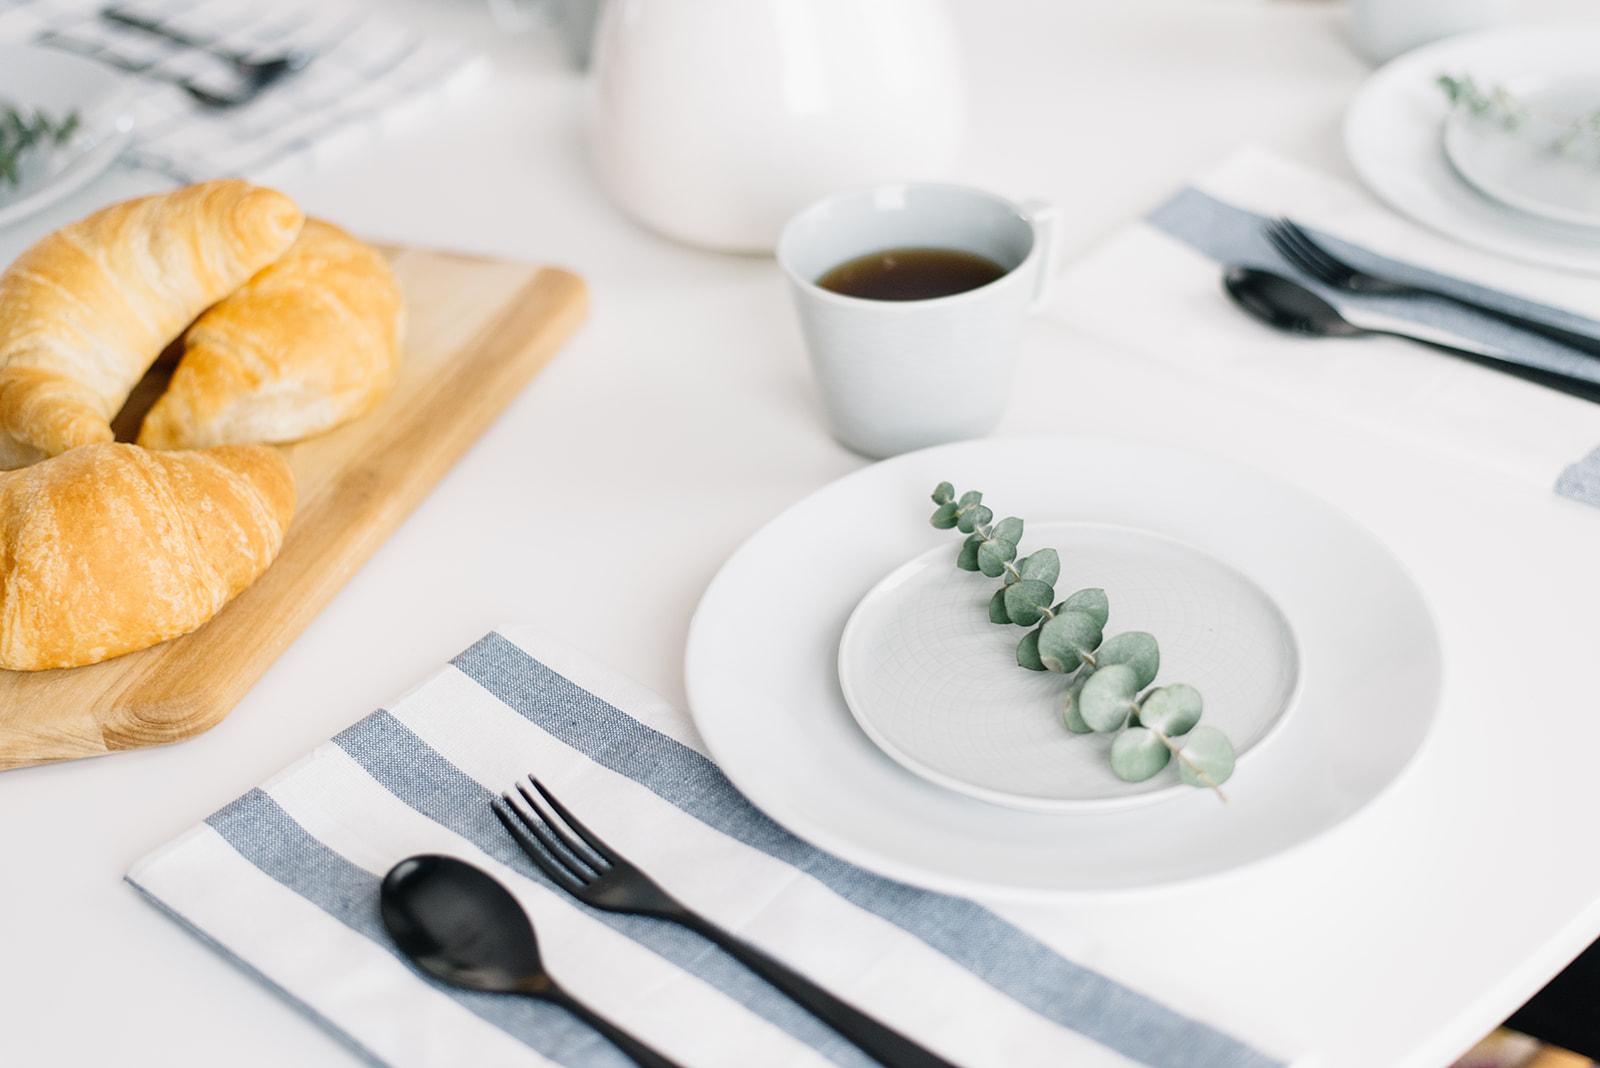 eucalyptus table setting, simple brunch decor